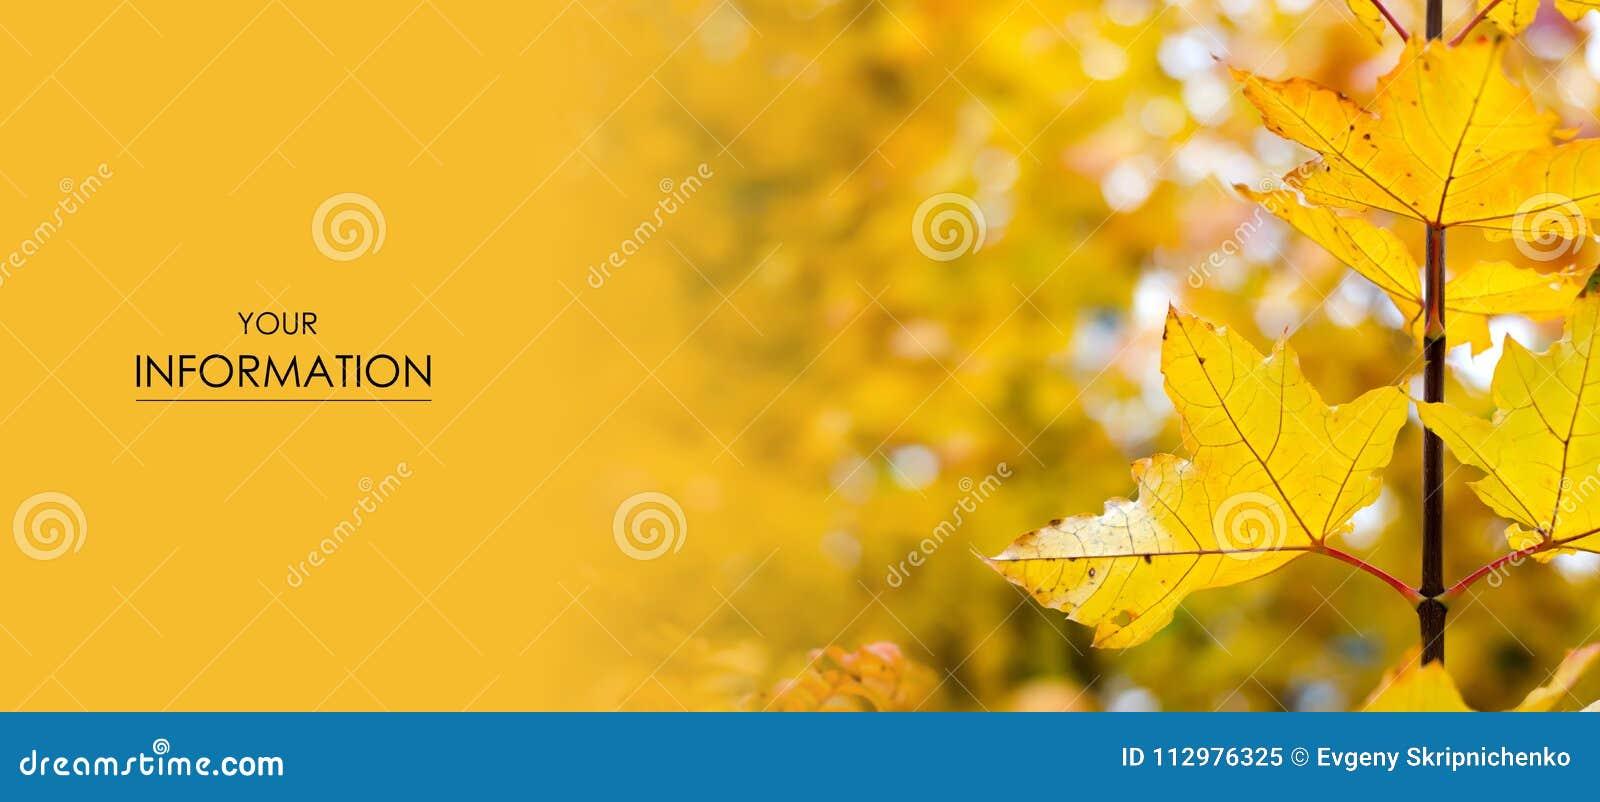 Orange yellow leaves autumn pattern